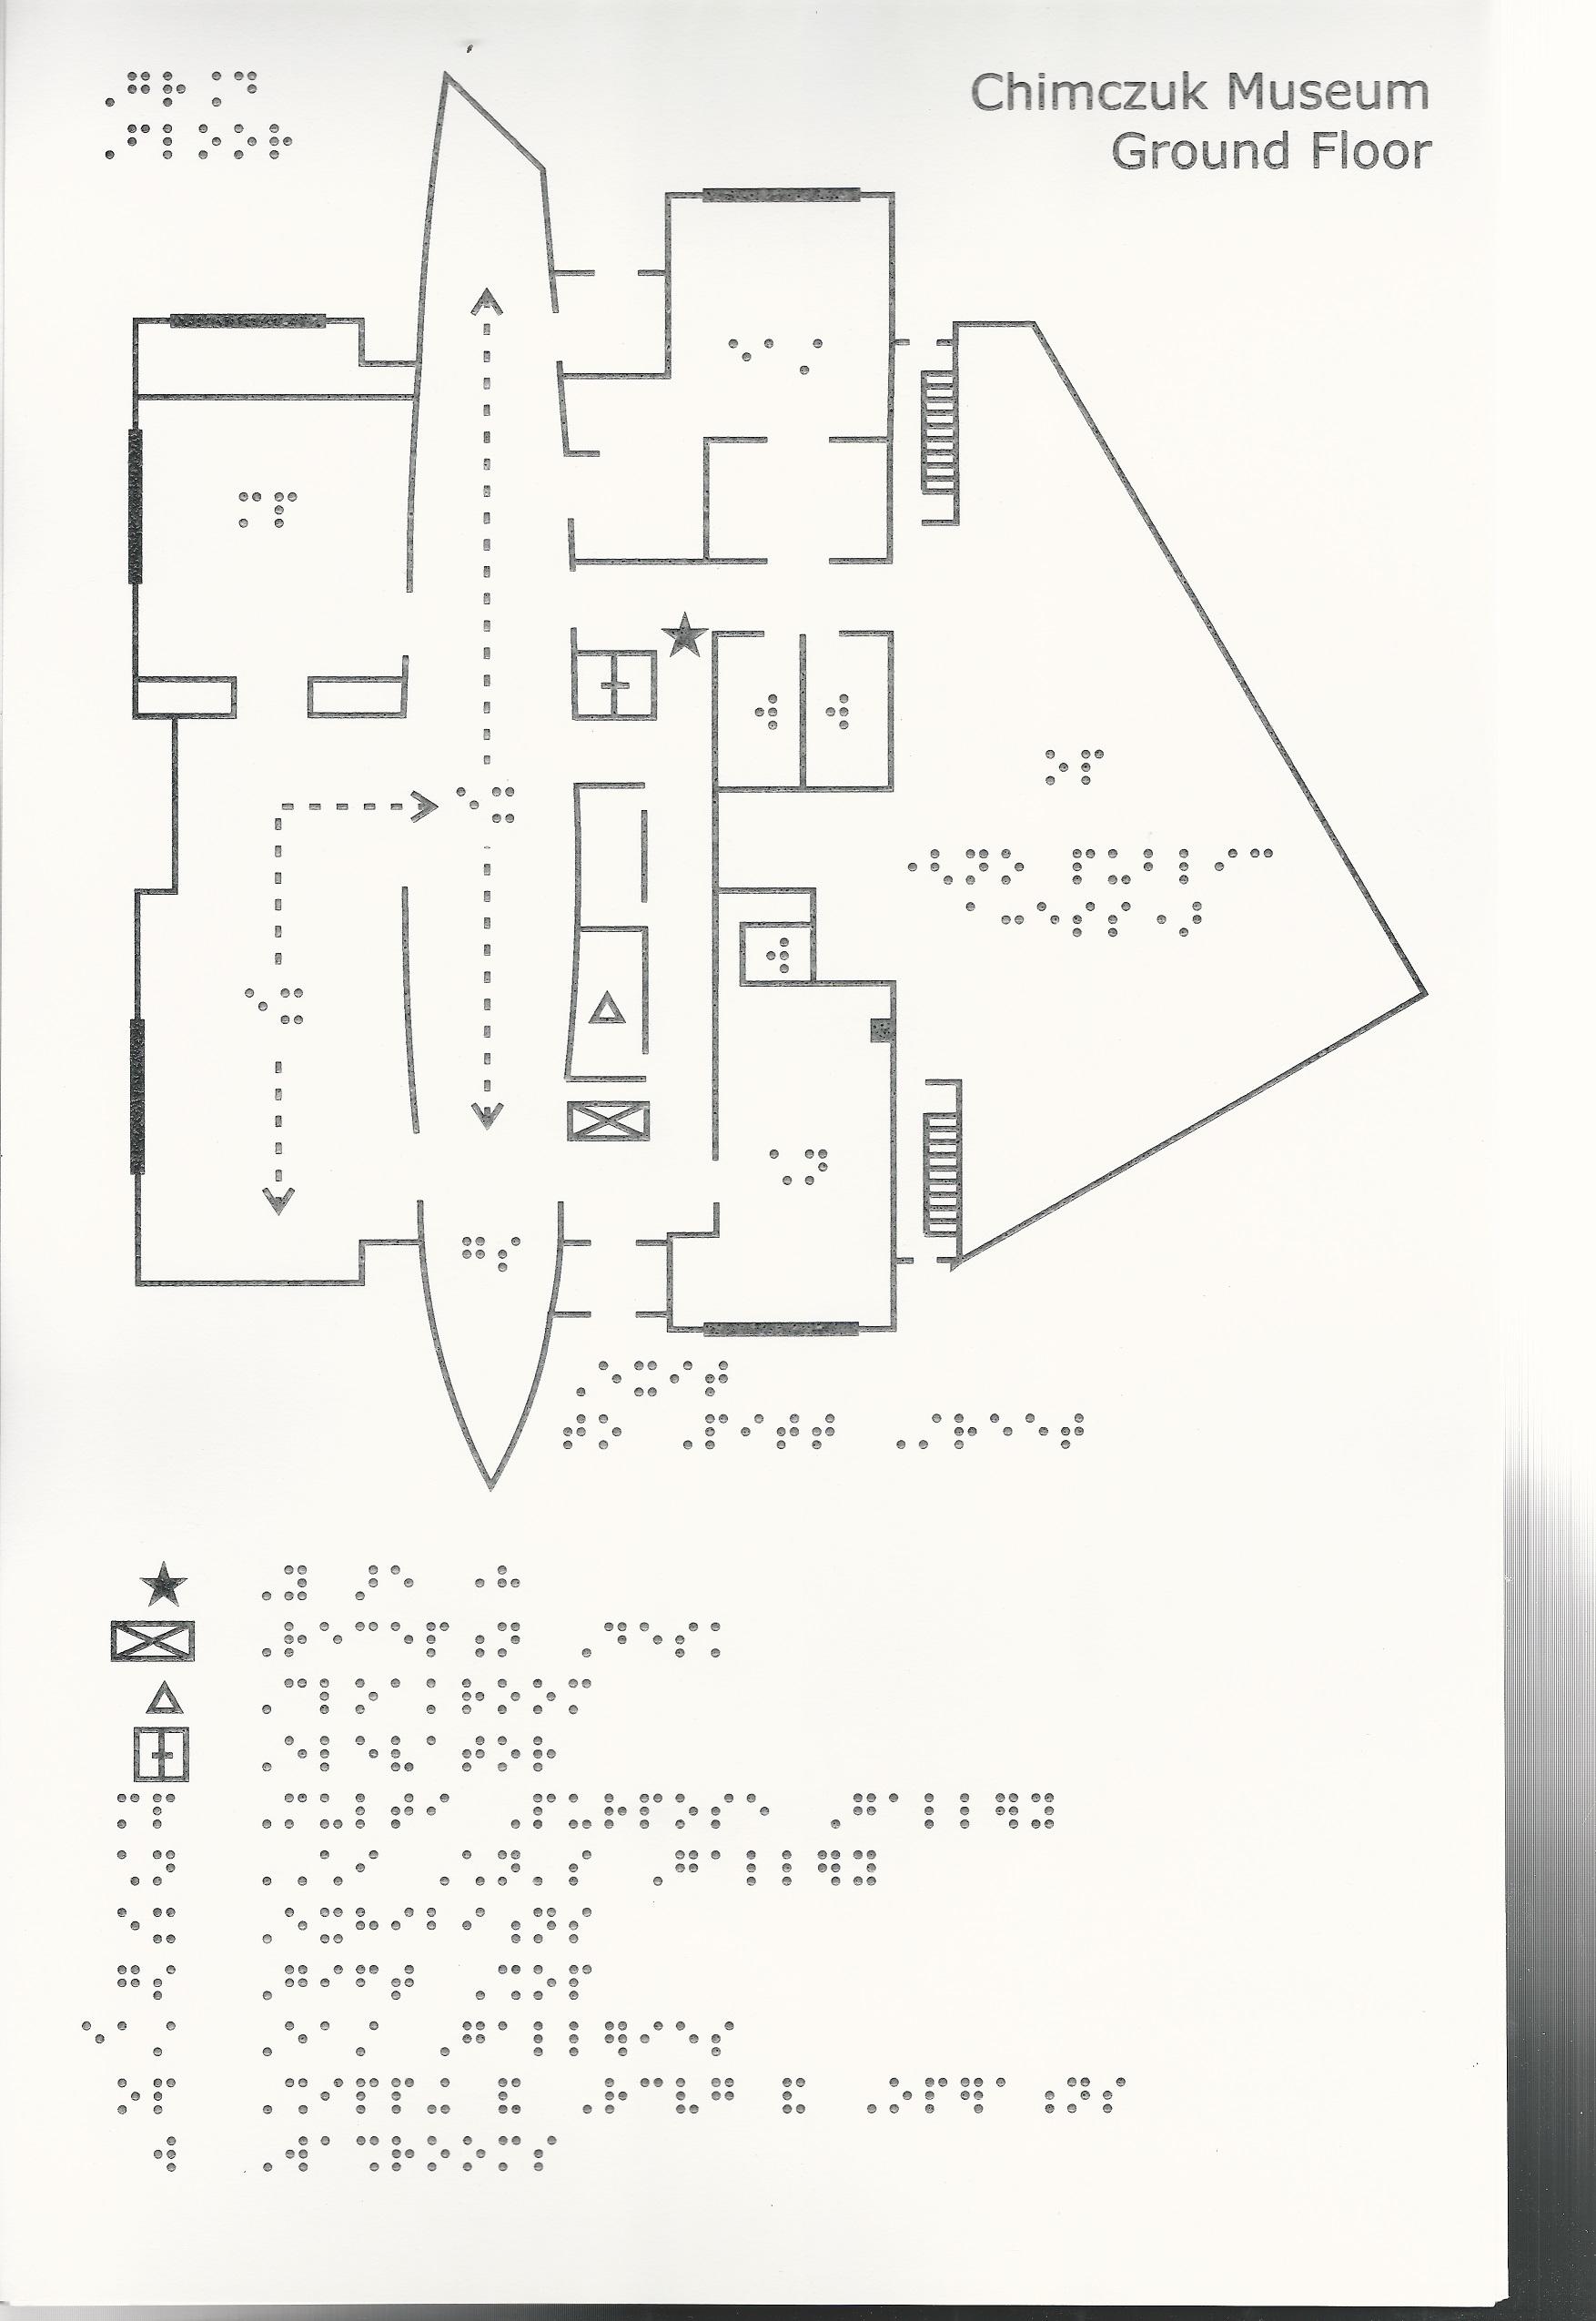 Braille map, ground floor, ChimCzuk Museum, Windsor Ontario